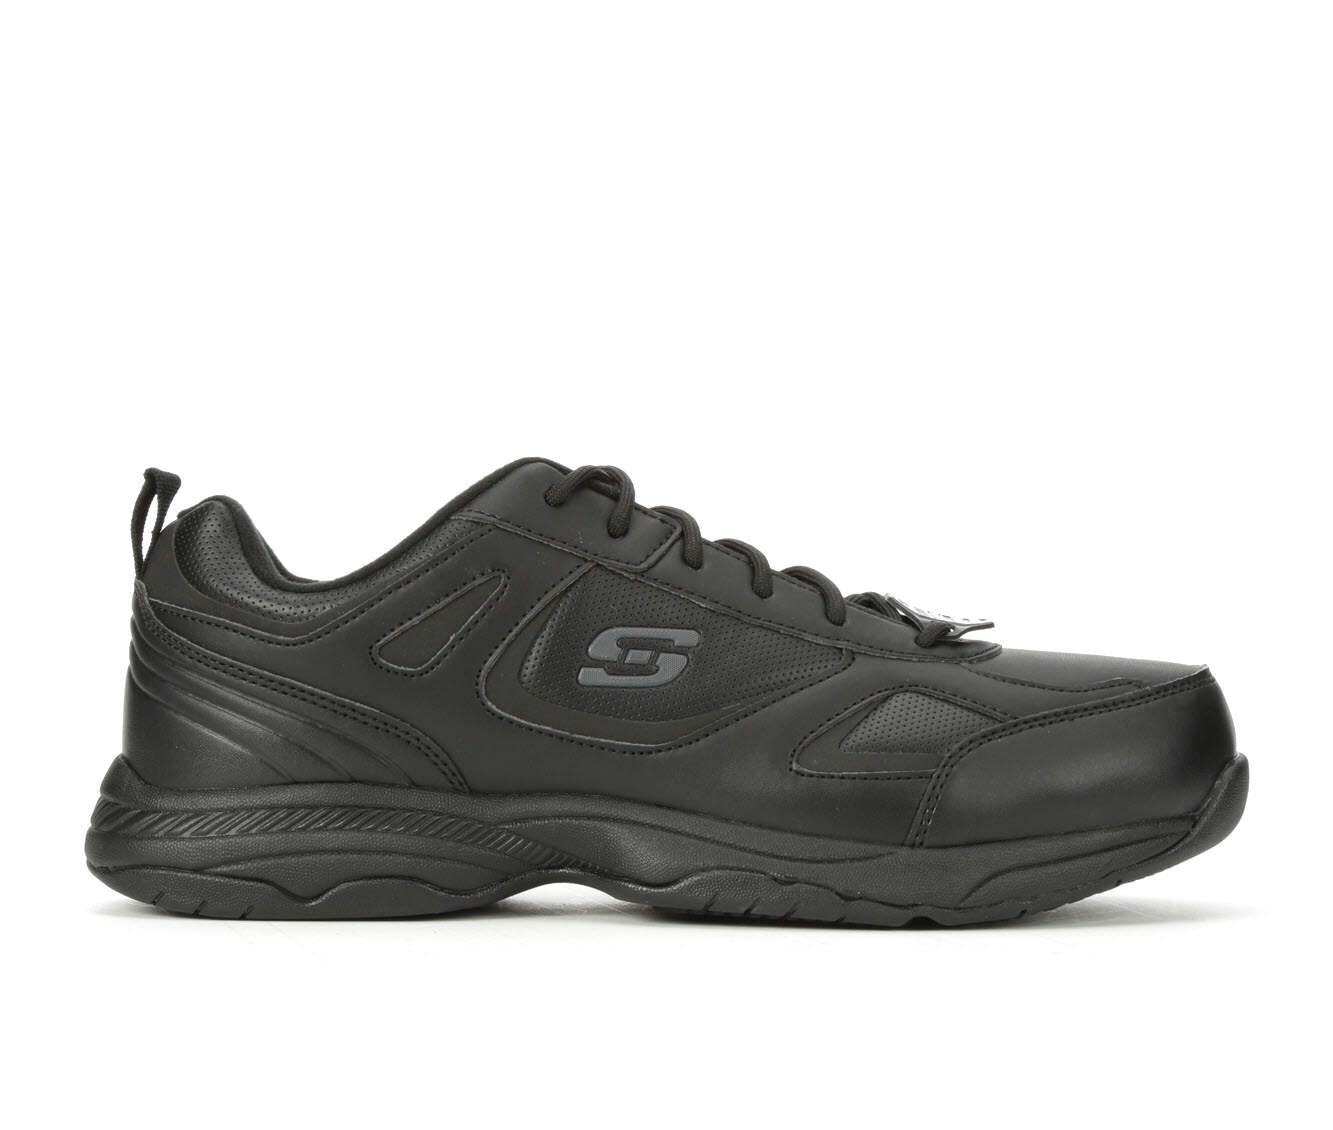 Men's Skechers Work Dighton 77111 Slip Resistant Shoes Black